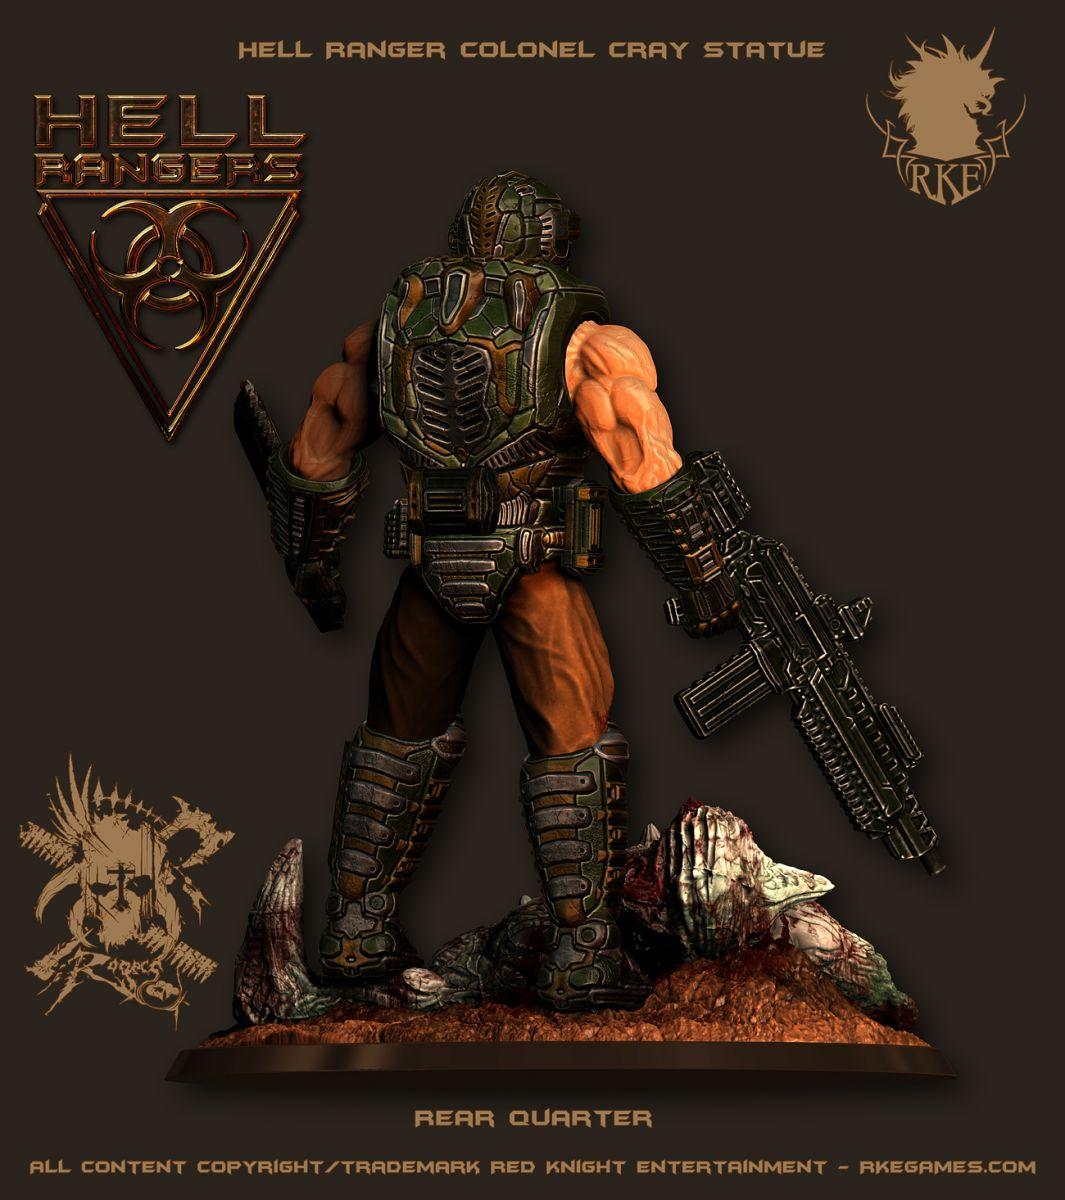 HR Ranger PreviewPic 008 ColonelCrayStatue 002 Hell Rangers RKE